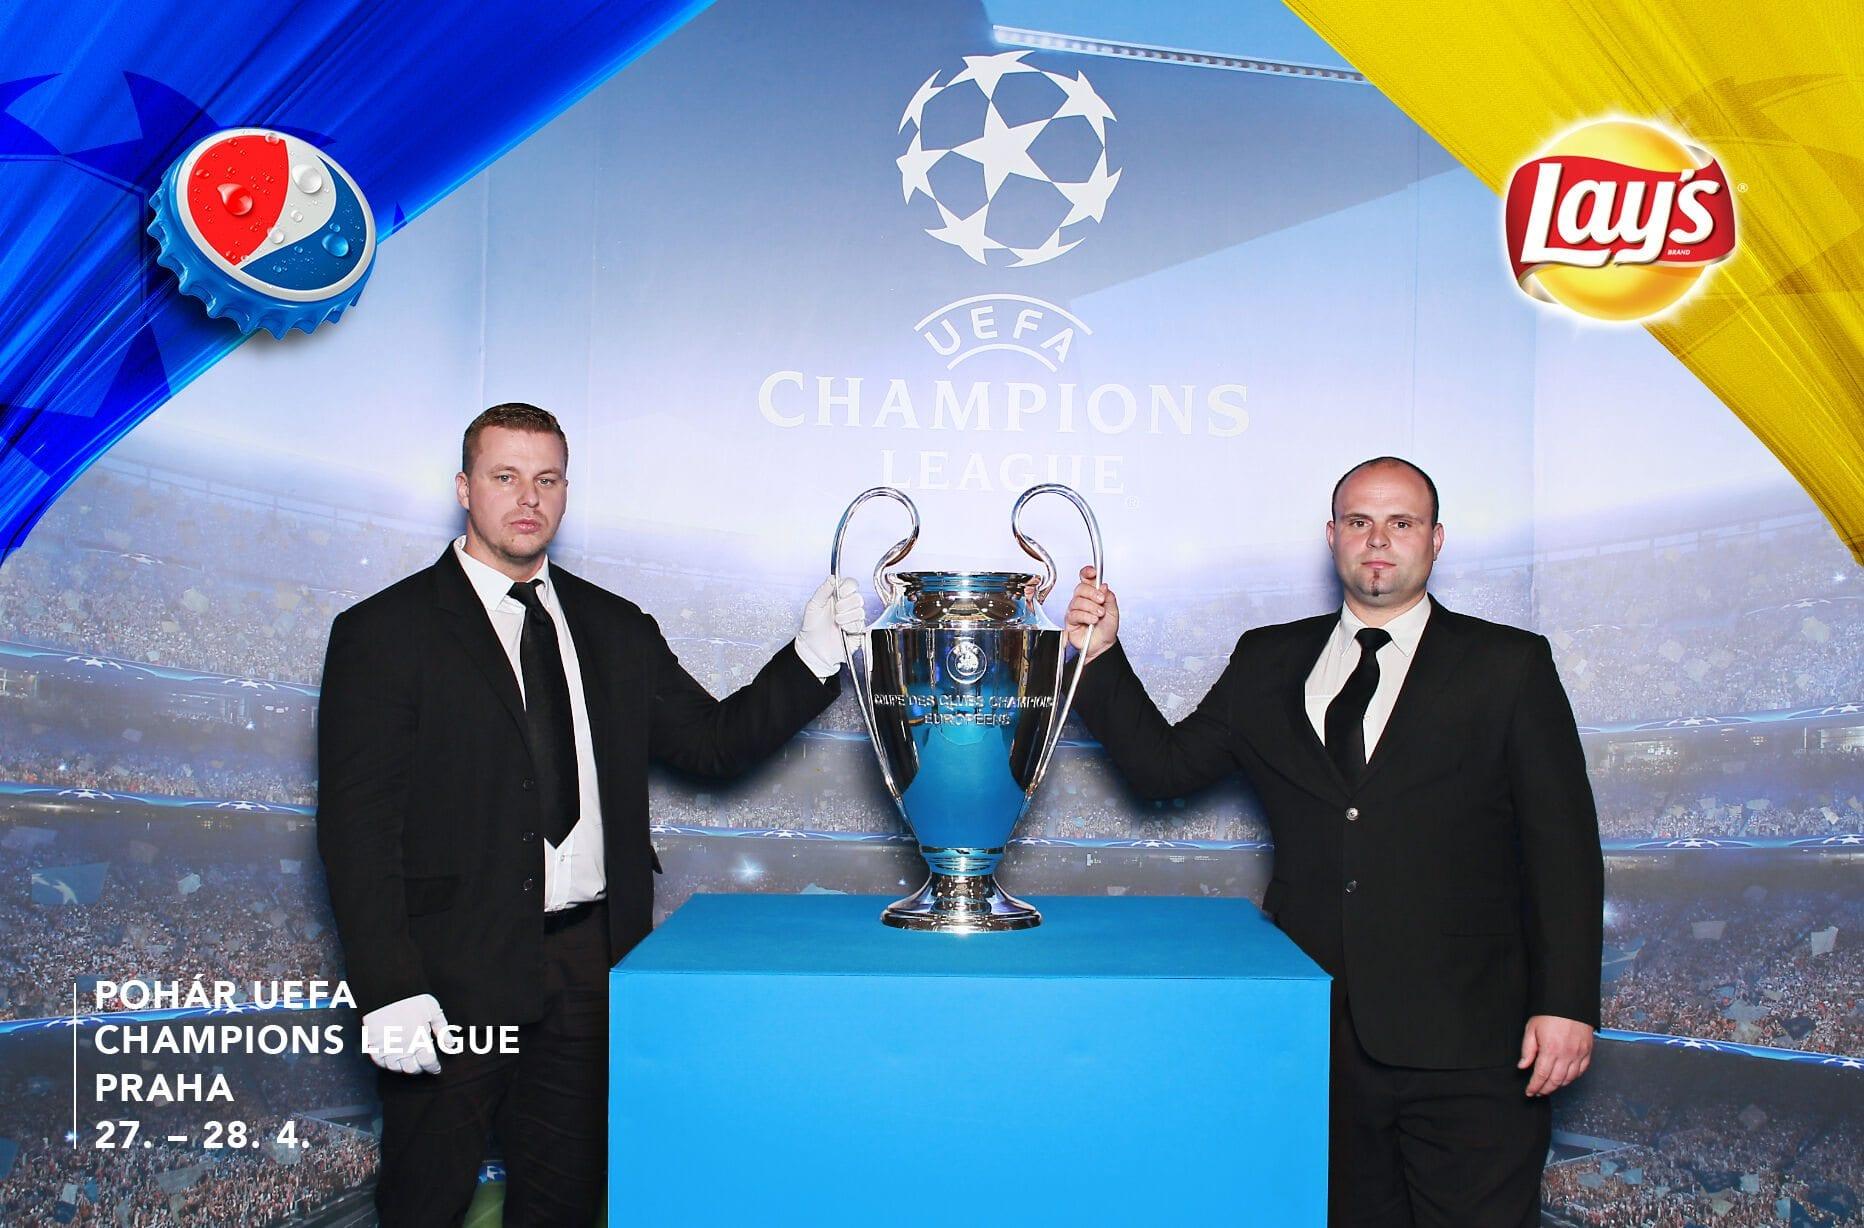 fotokoutek-uefa-28-4-2017-1-239810